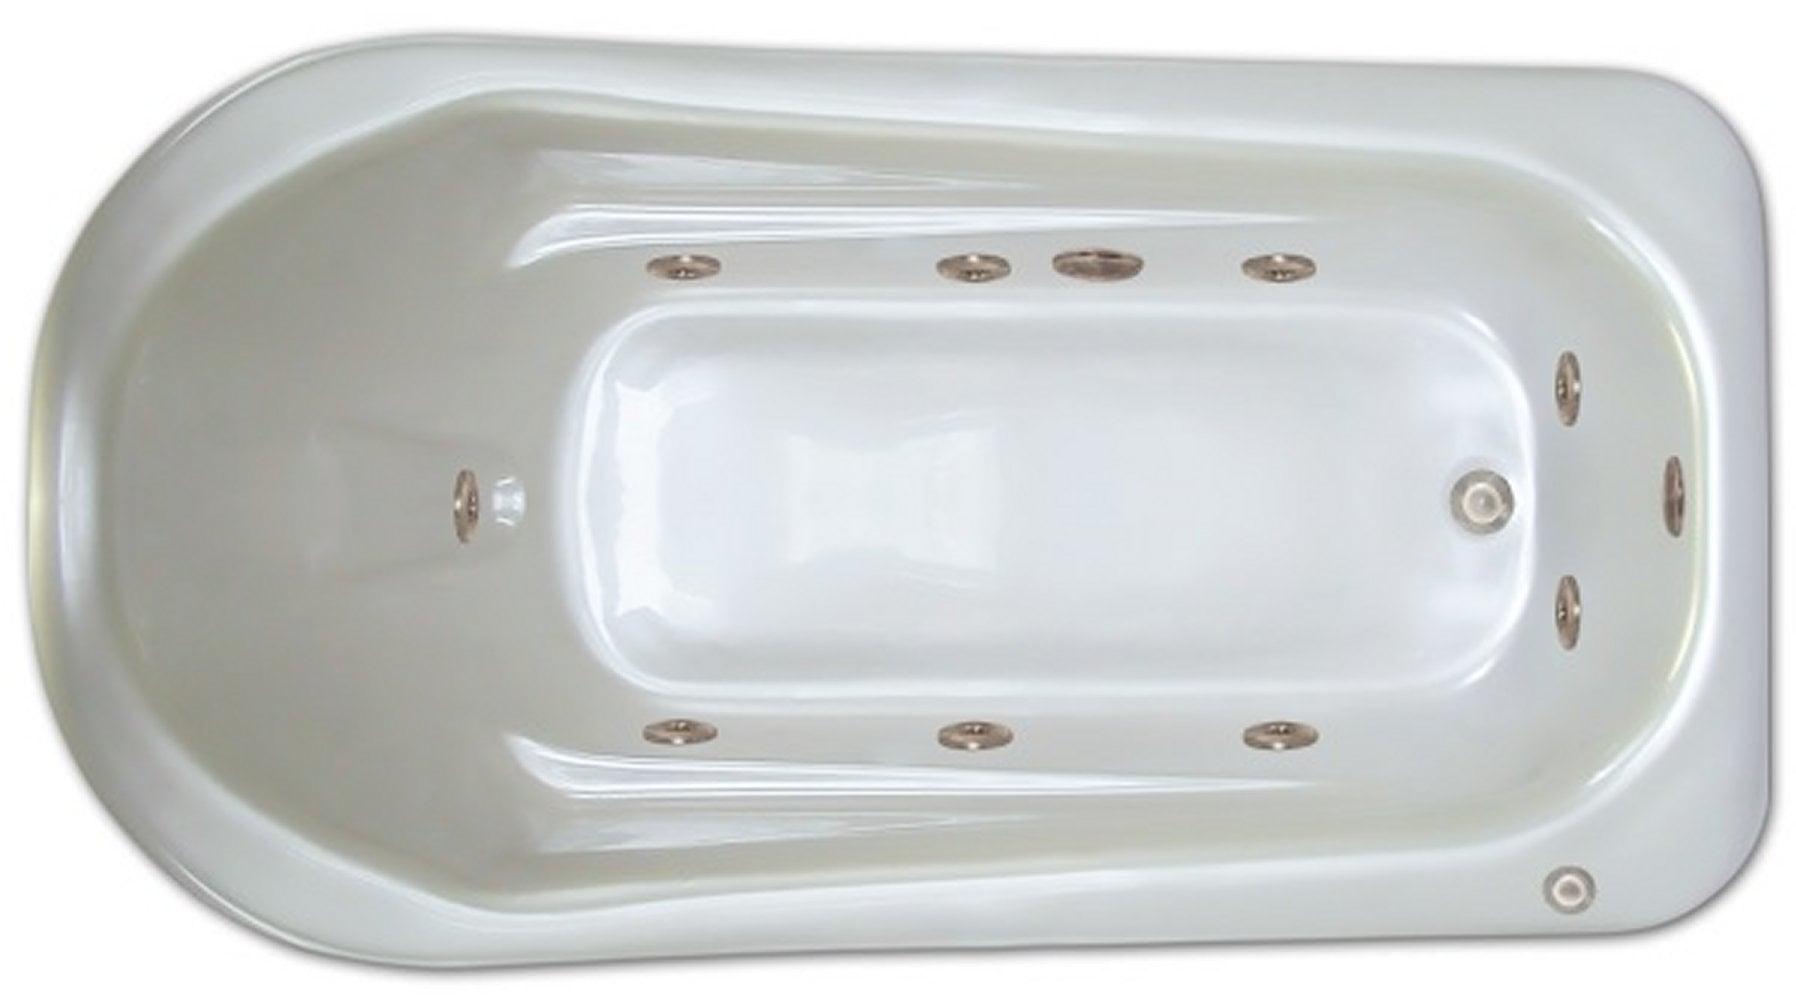 Drop-in Bathtub / 72x36x18 / high gloss white acrylic / Rectangle / LPI279-W-RD Pinnacle Bath - Whirlpool 0